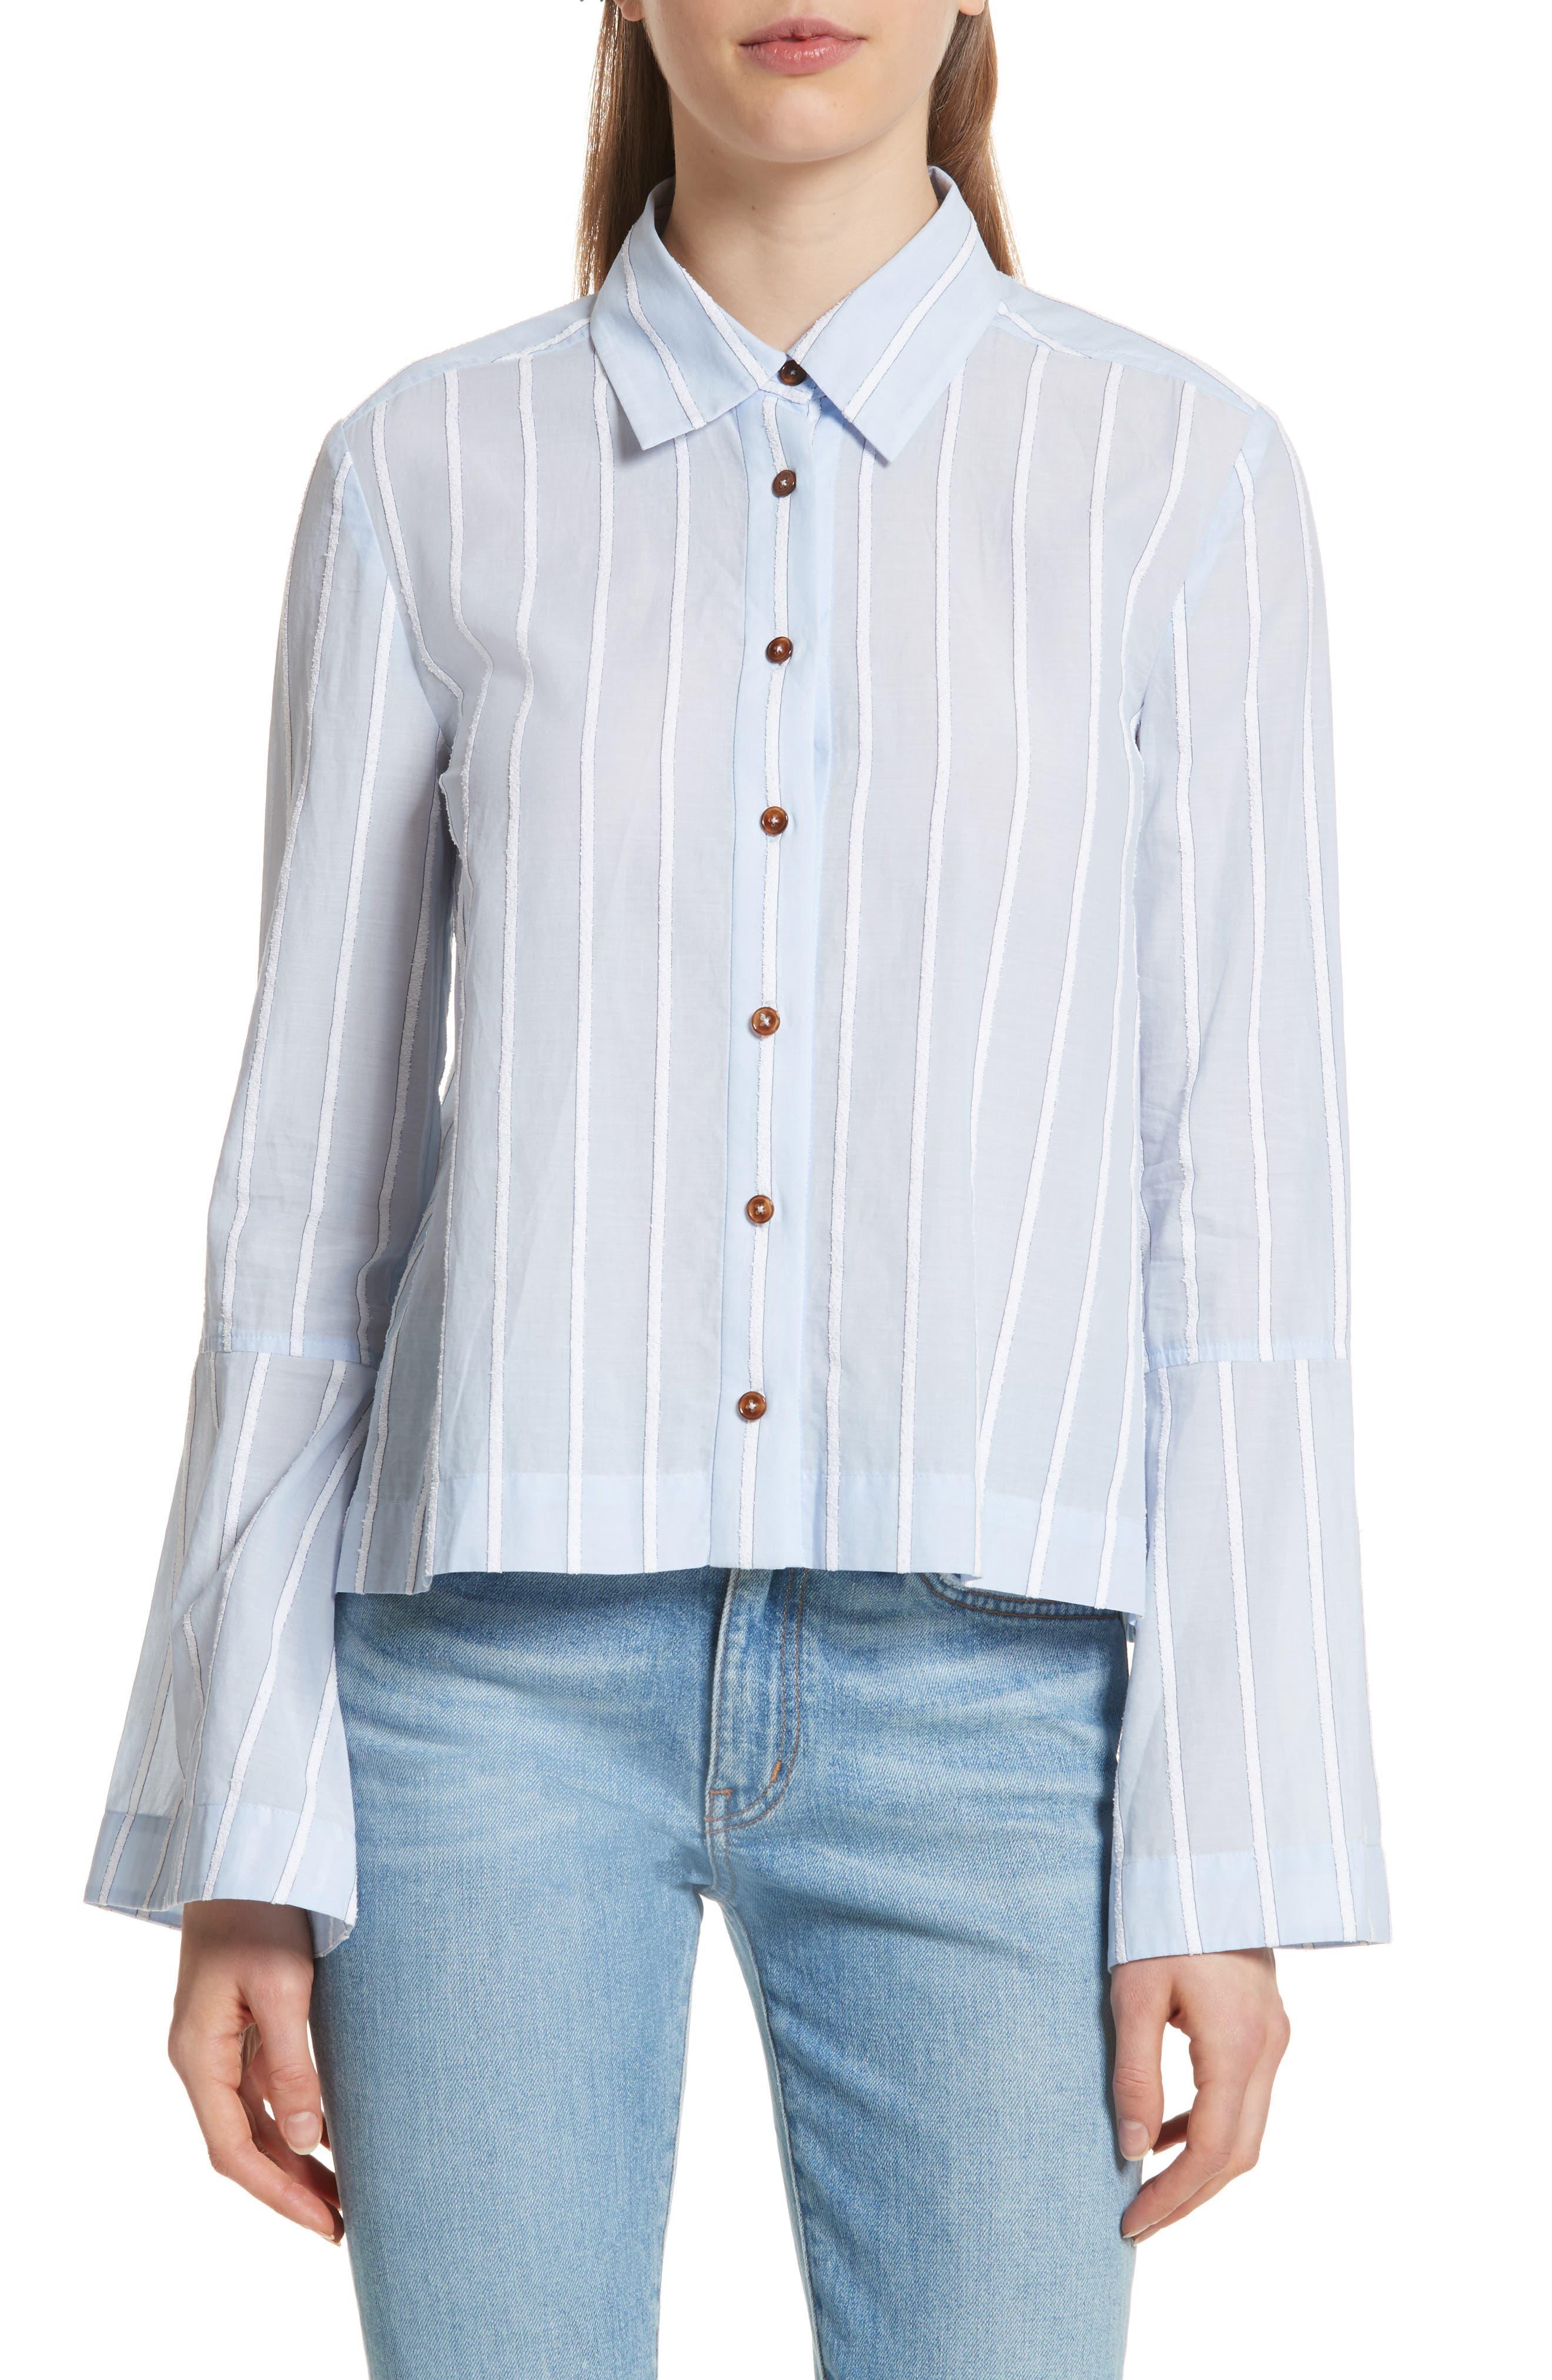 Derek Lam 10 Crosby Bouclé Stripe Shirt